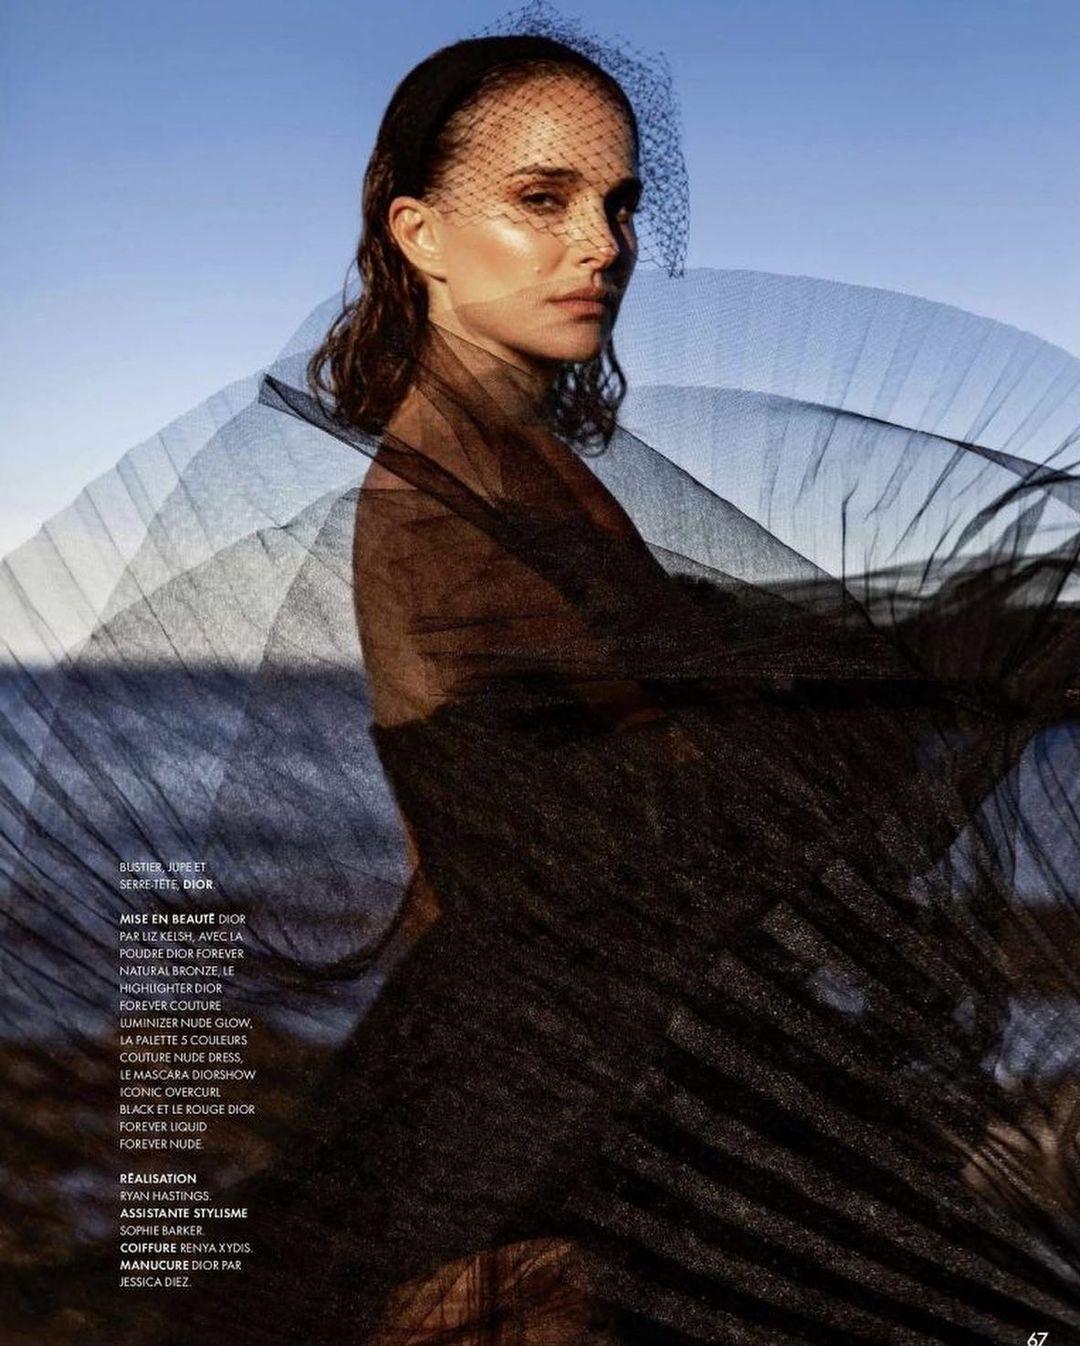 Натали Портман украсила обложку известного глянца (ФОТО) - фото №1